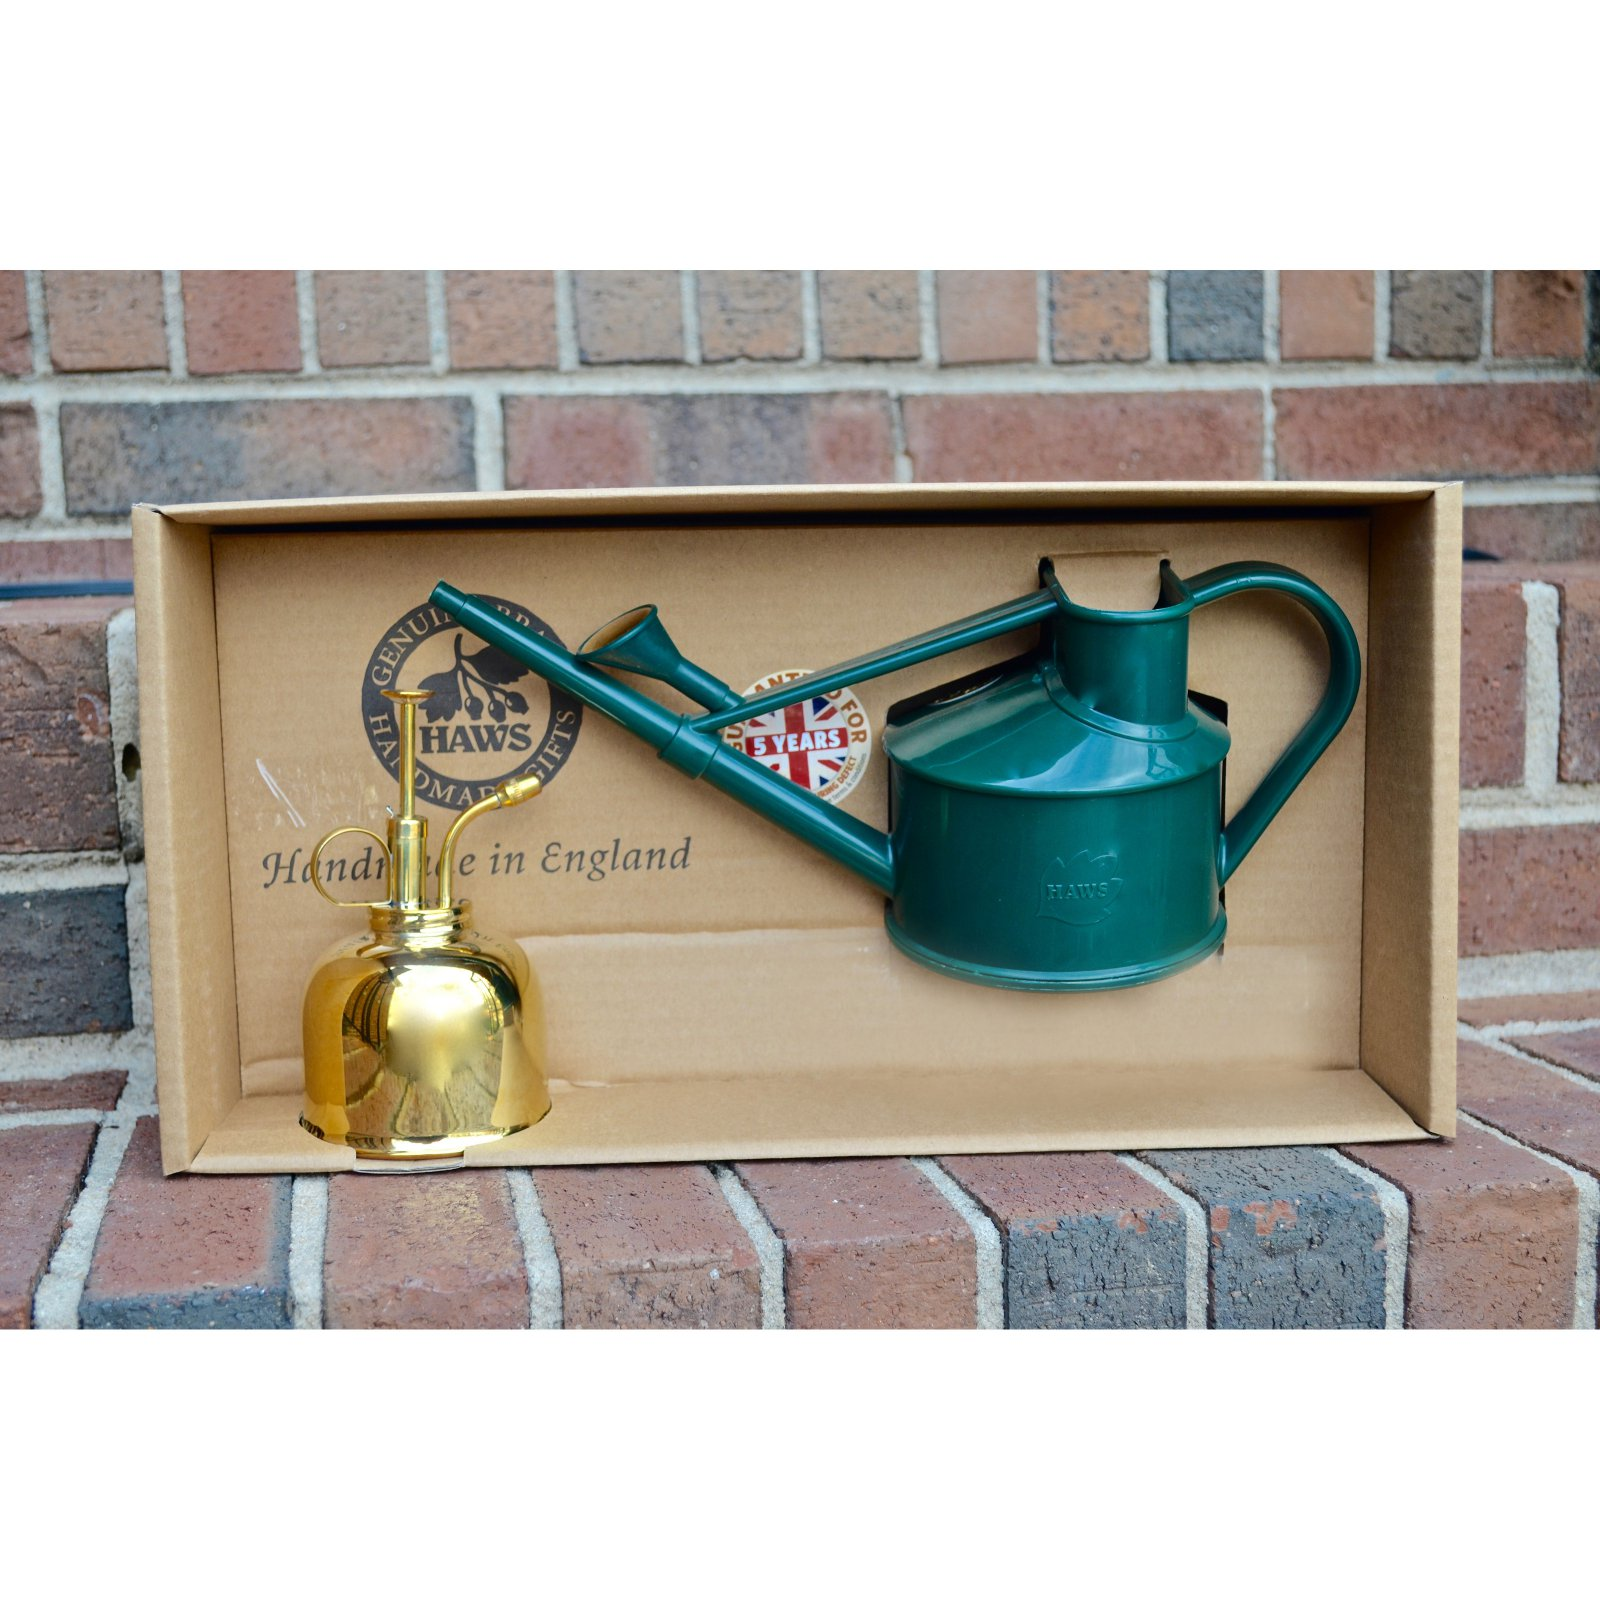 Haws Spray-n-Sprinkle Garden Gift Box Set